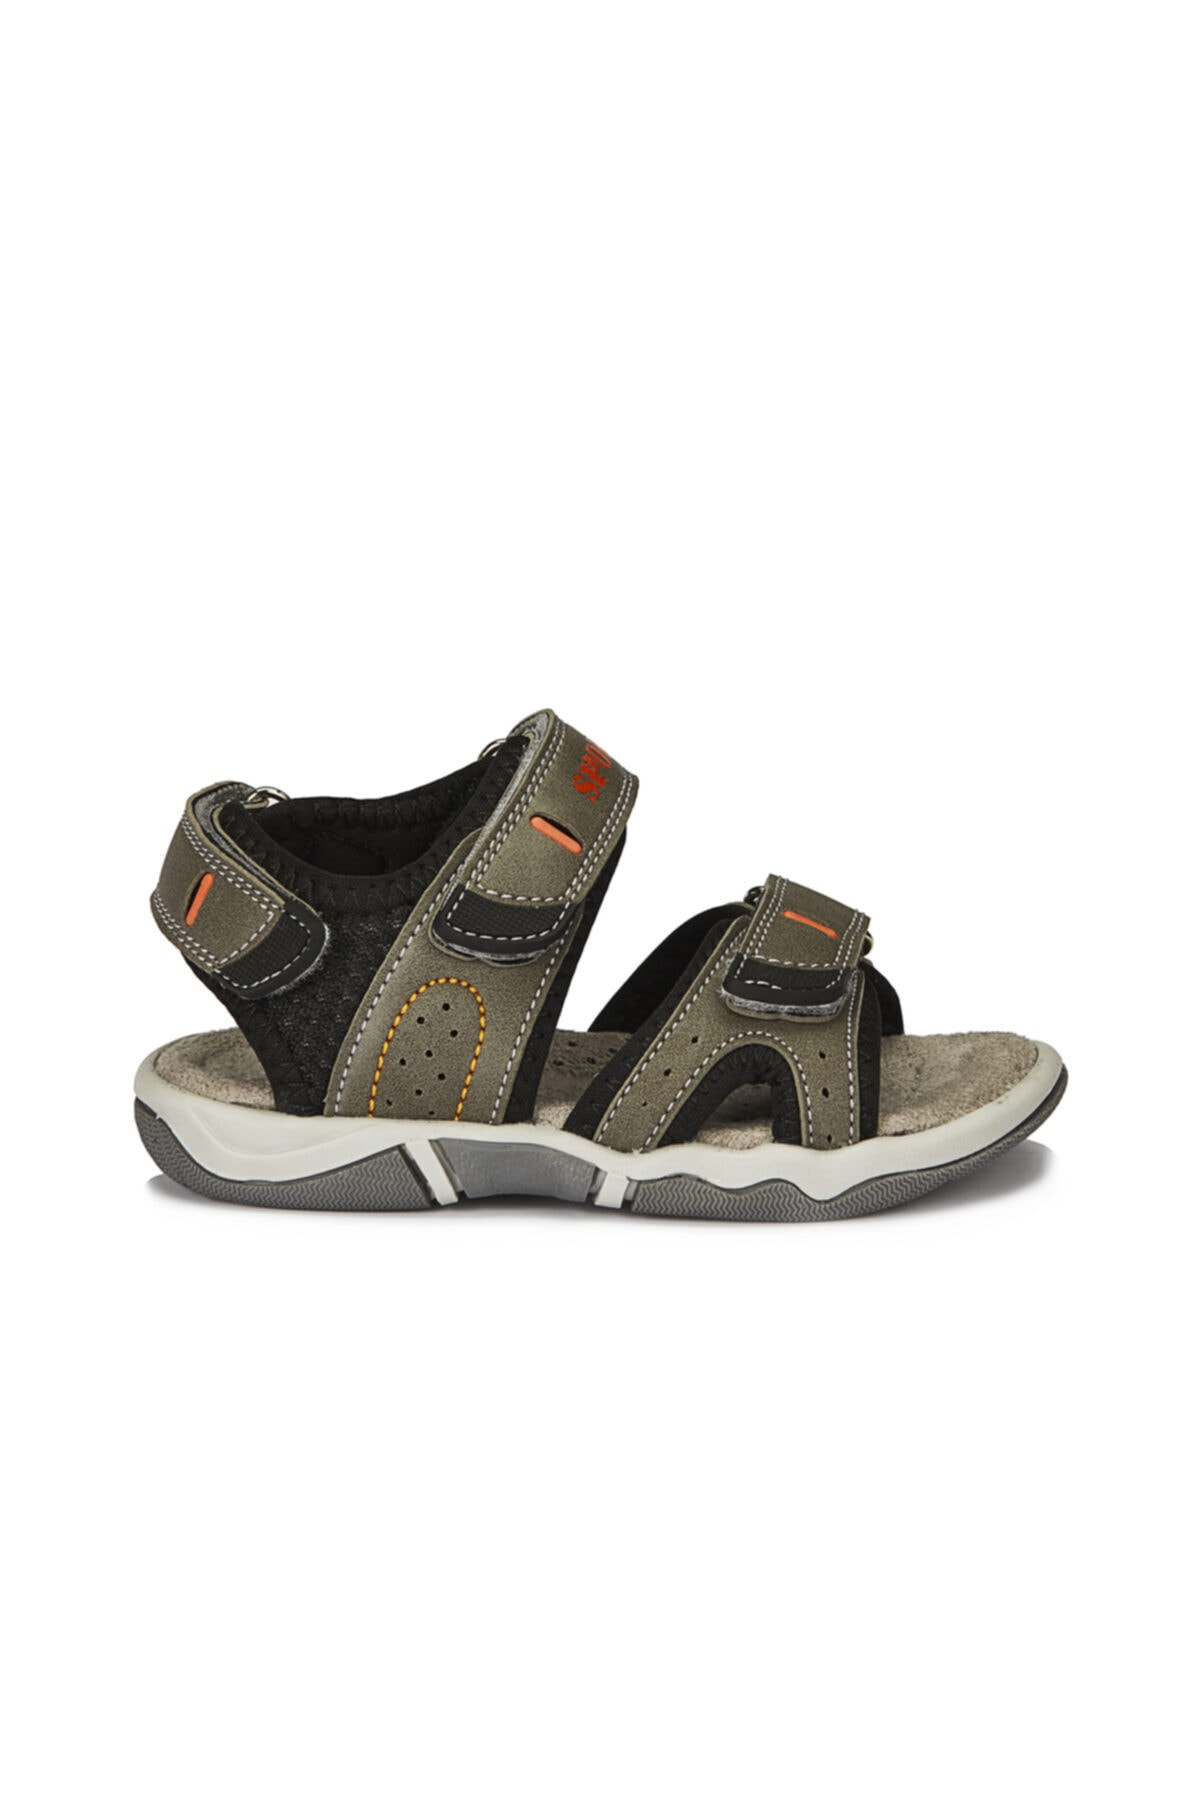 Füme Sandalet